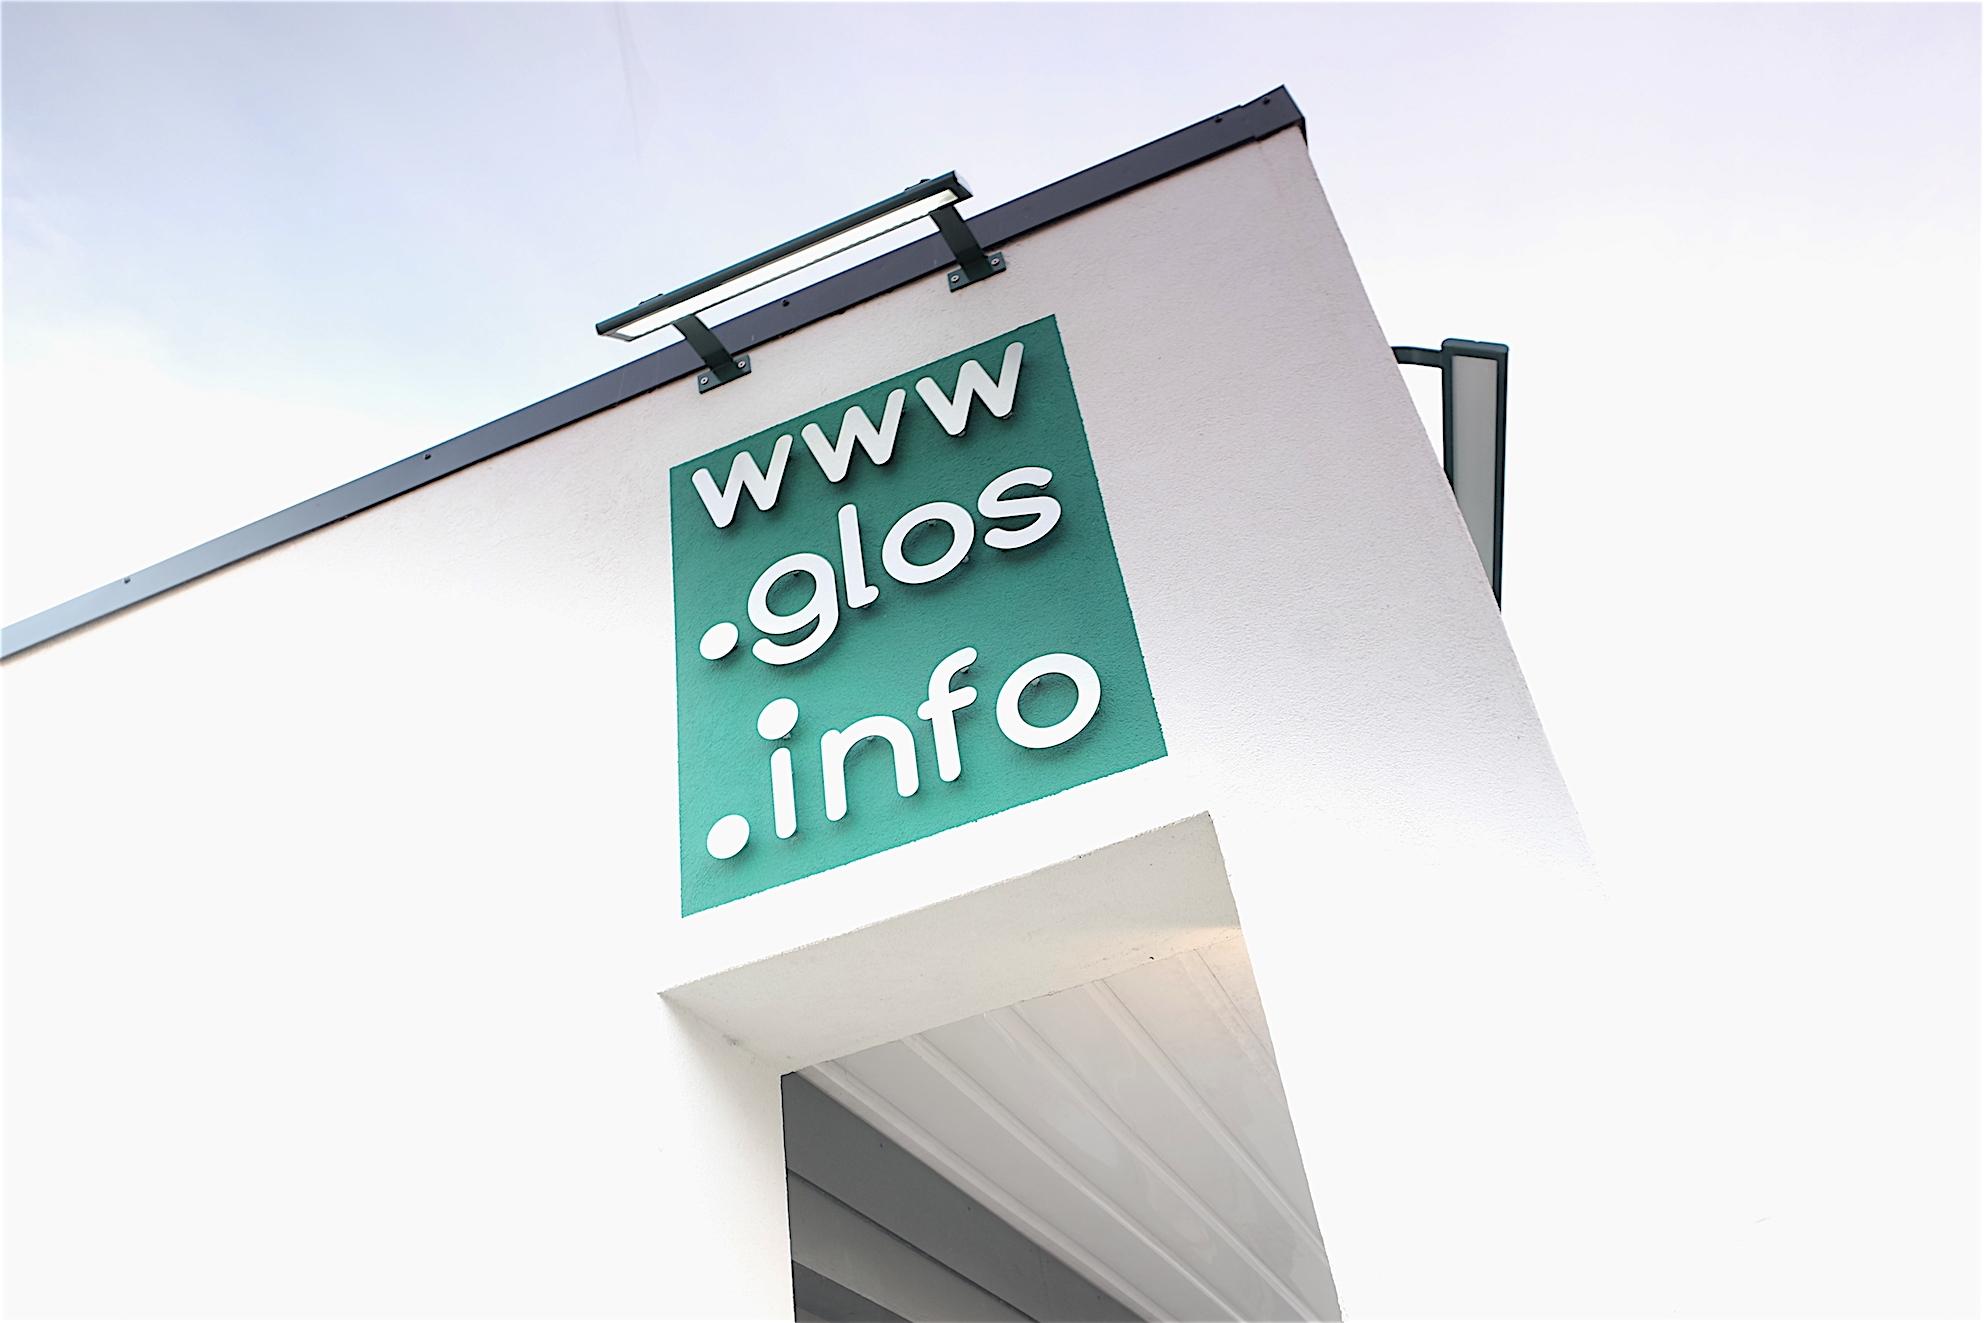 Glos Info exterior sign and external light